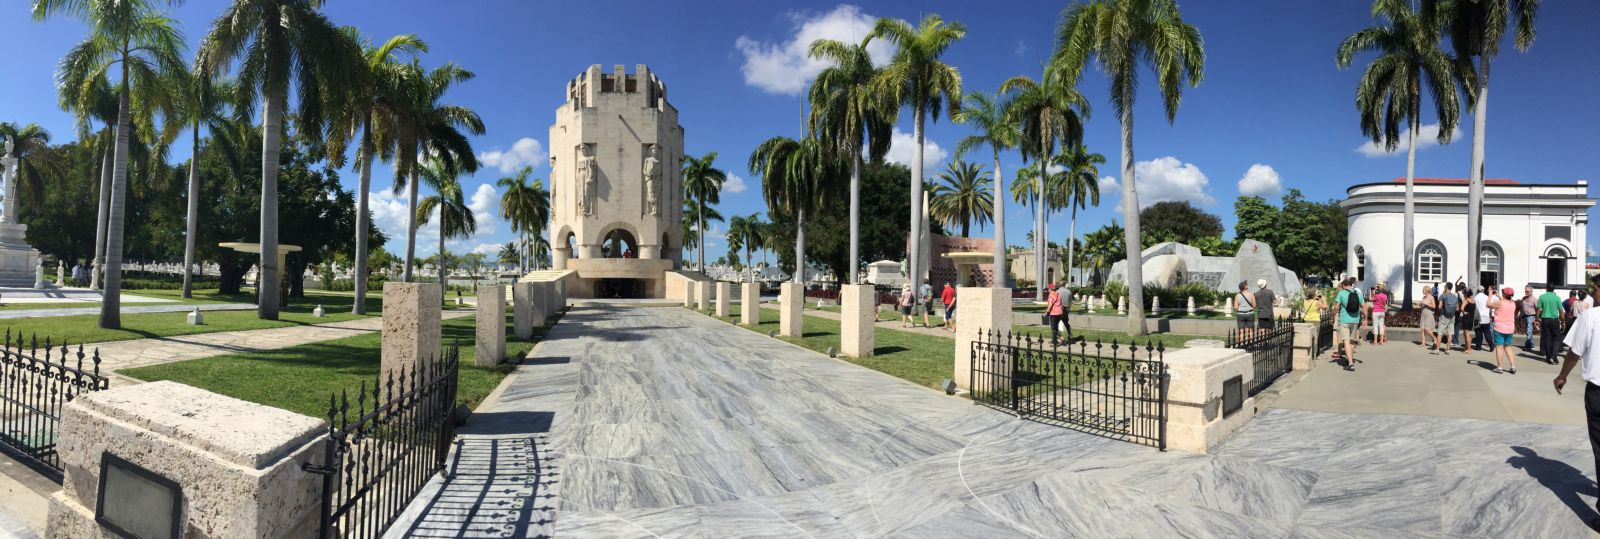 157 Santiago de Cuba